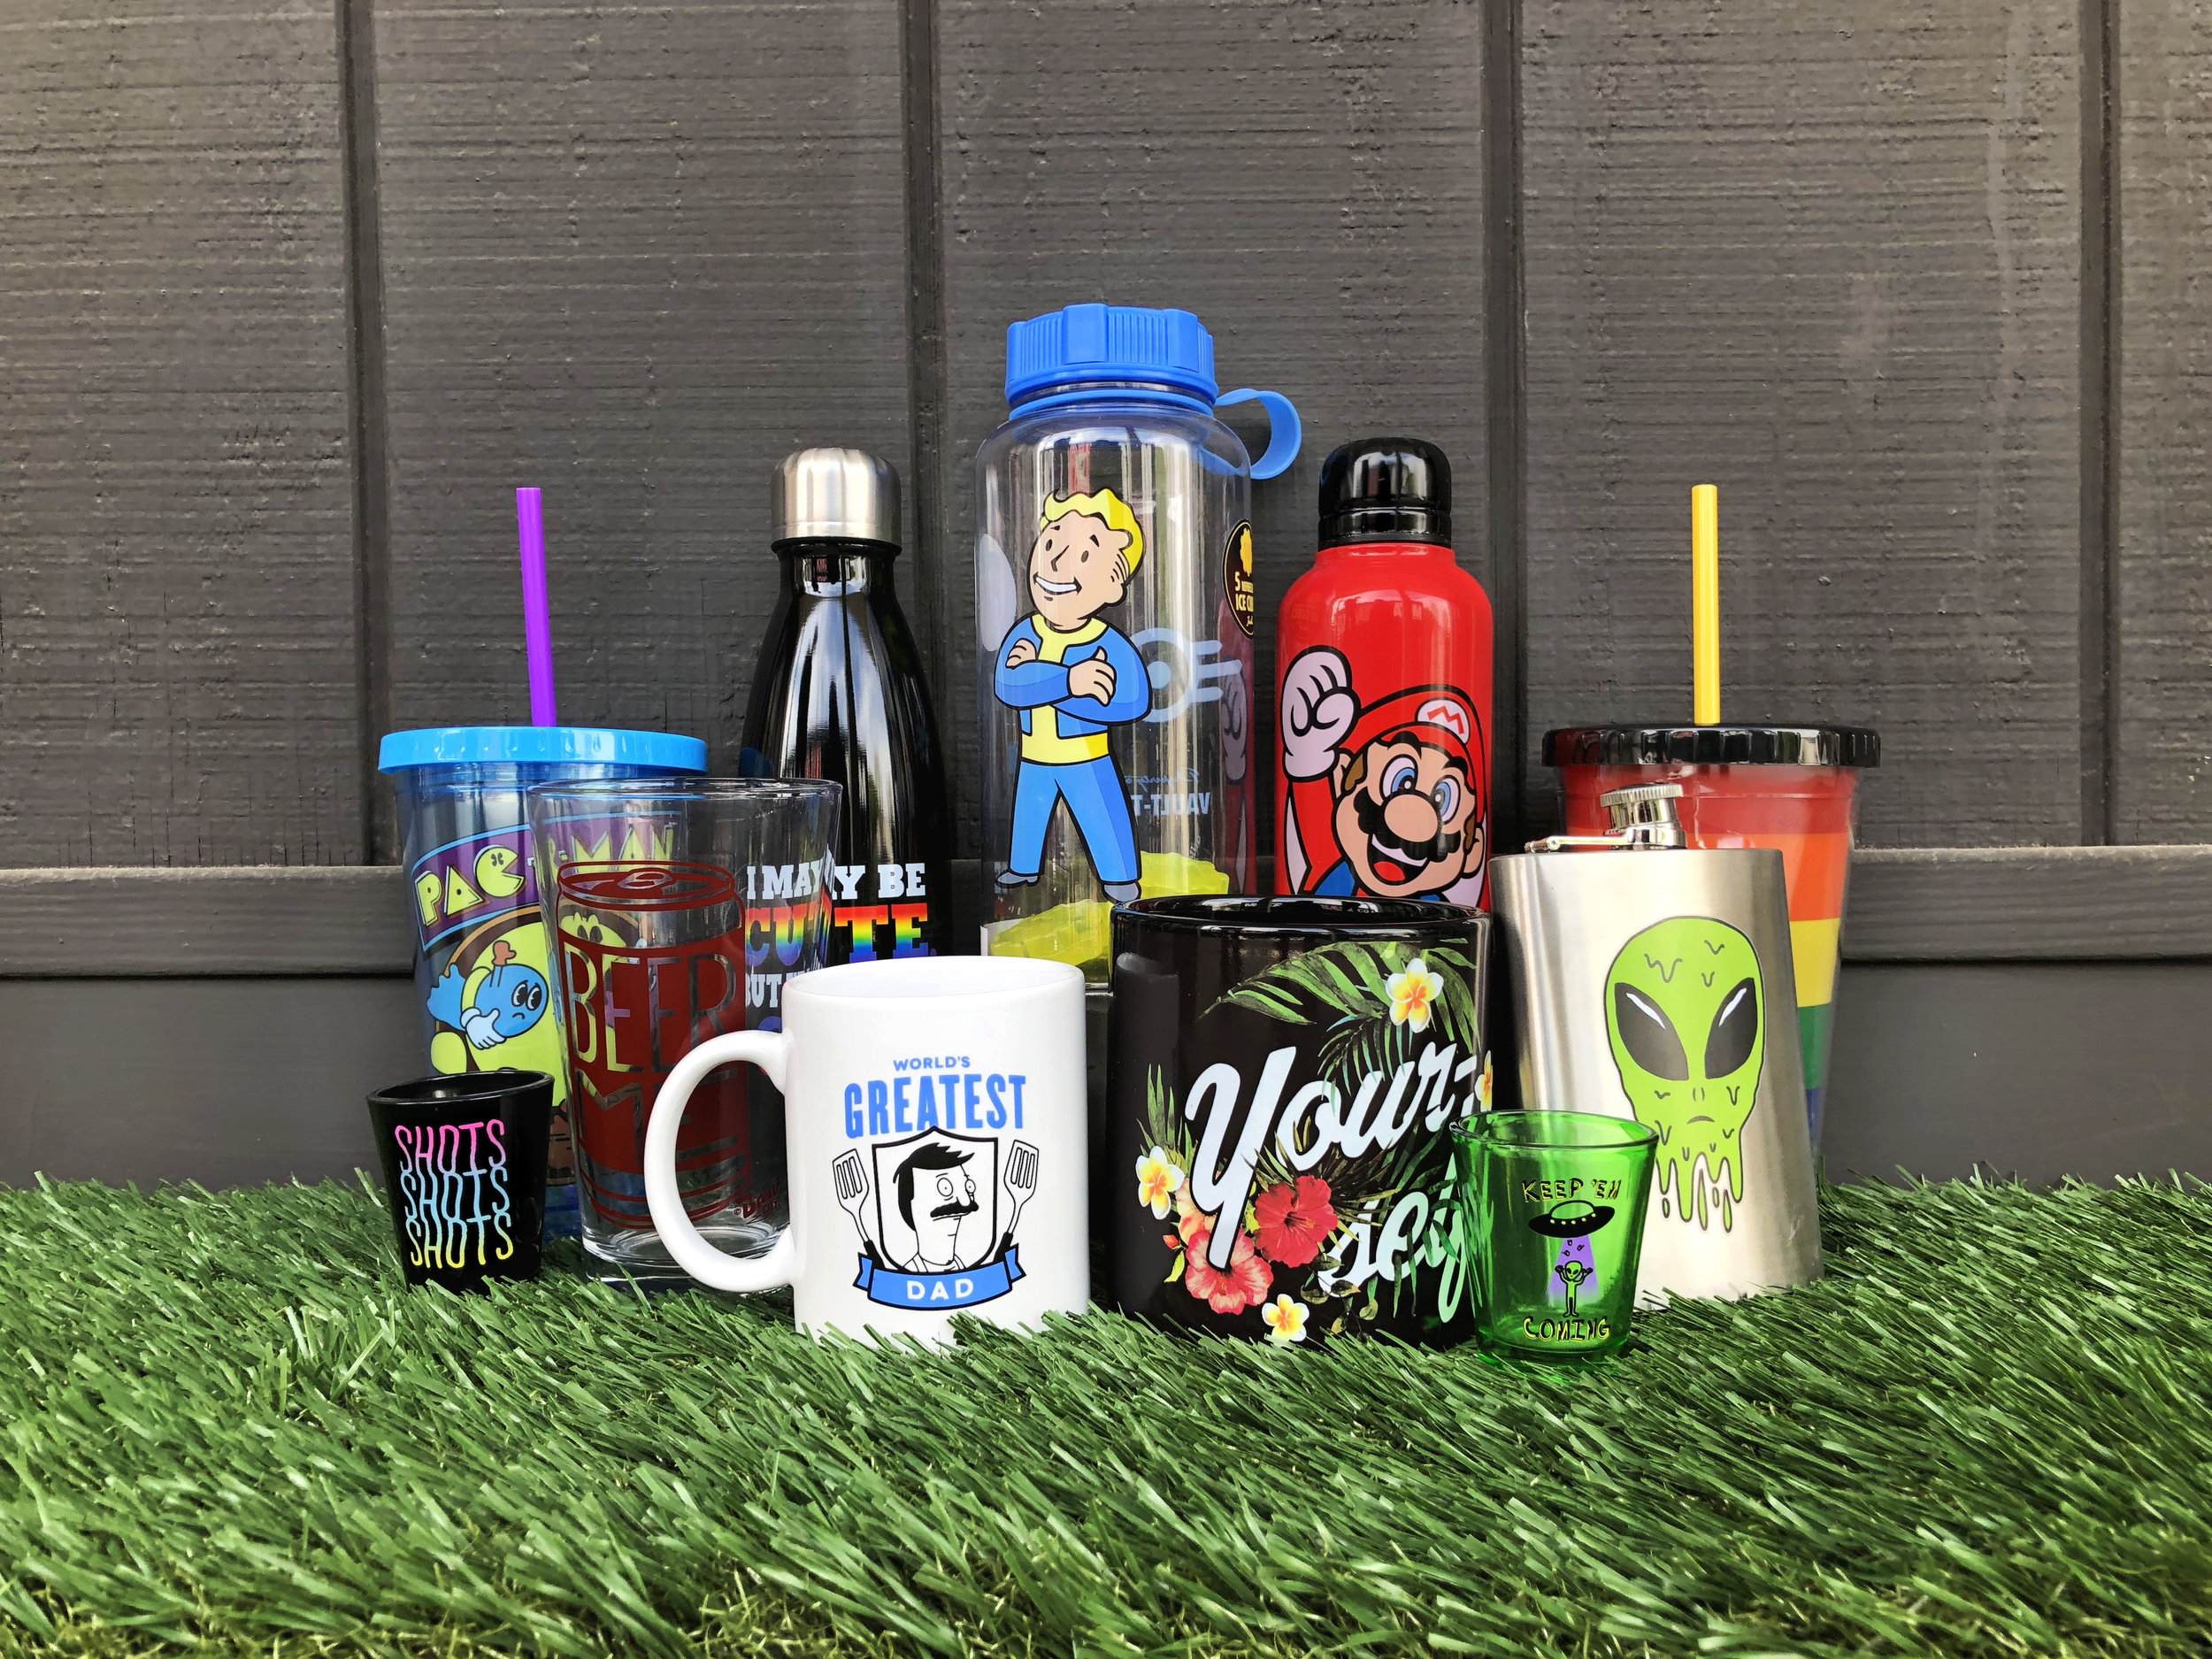 cups_group_shot.jpg